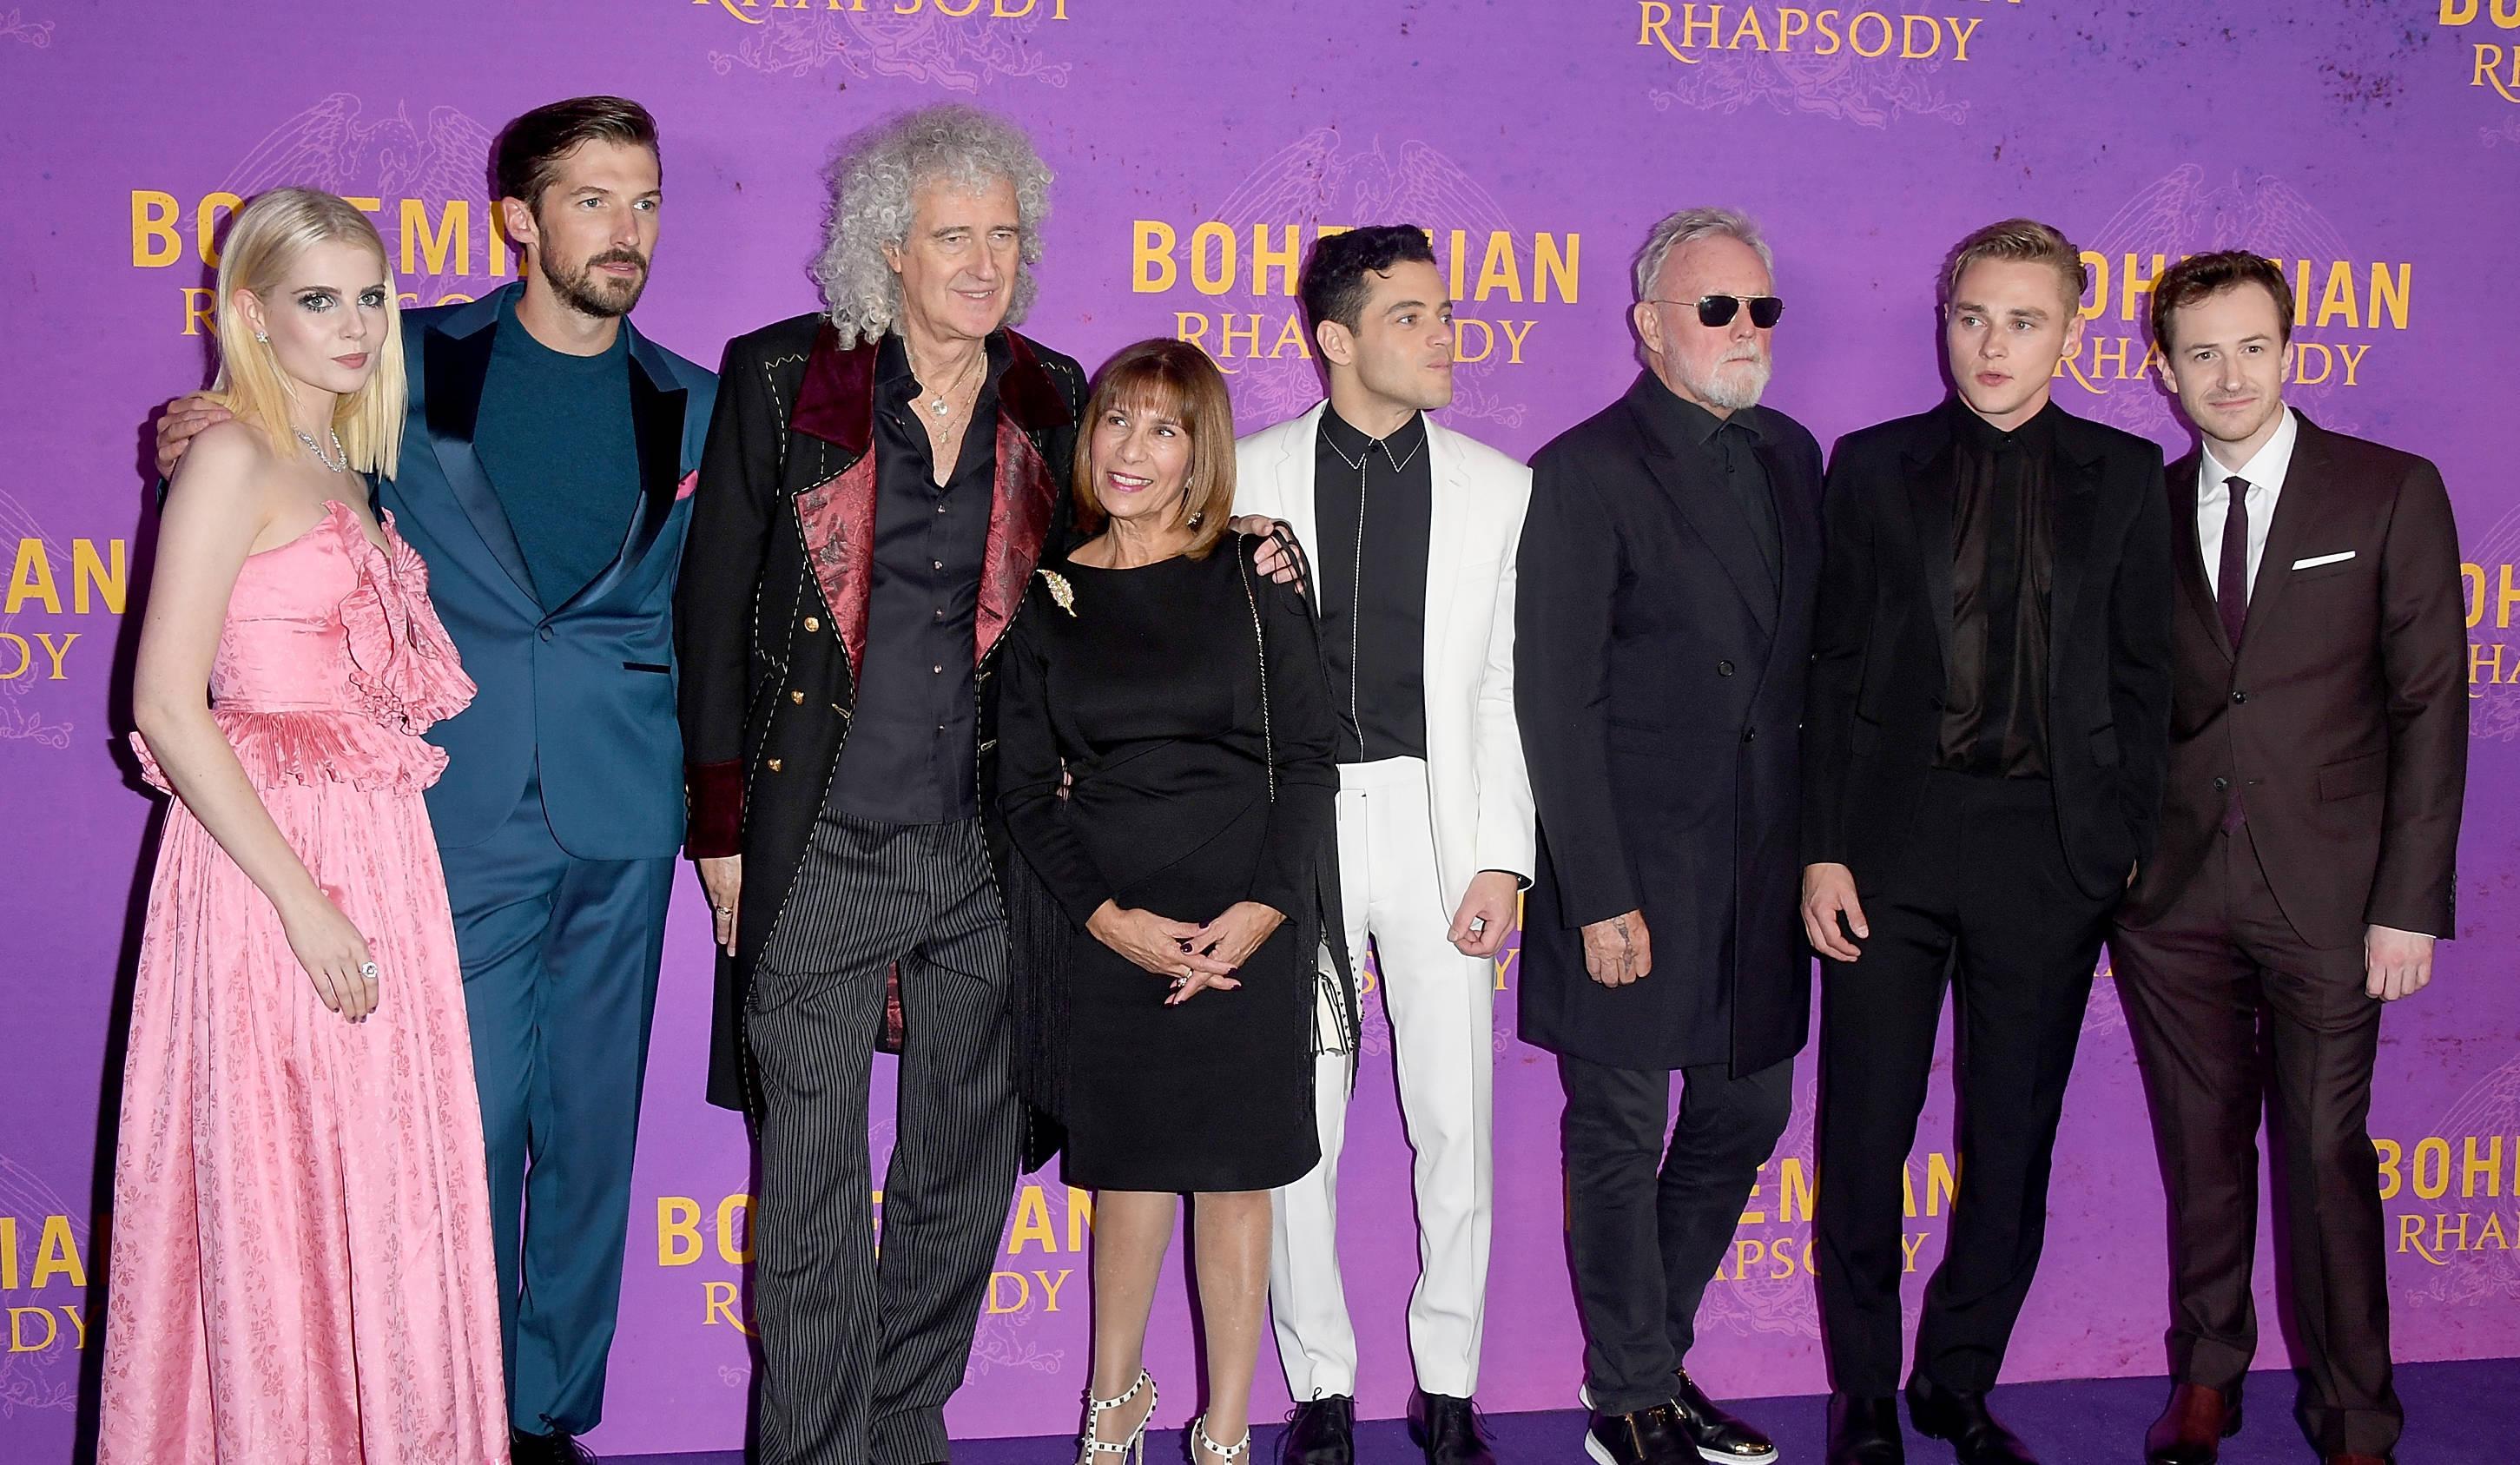 Brian May Zeigt Bohemian Rhapsody Cast Wie Queen Power Aussieht